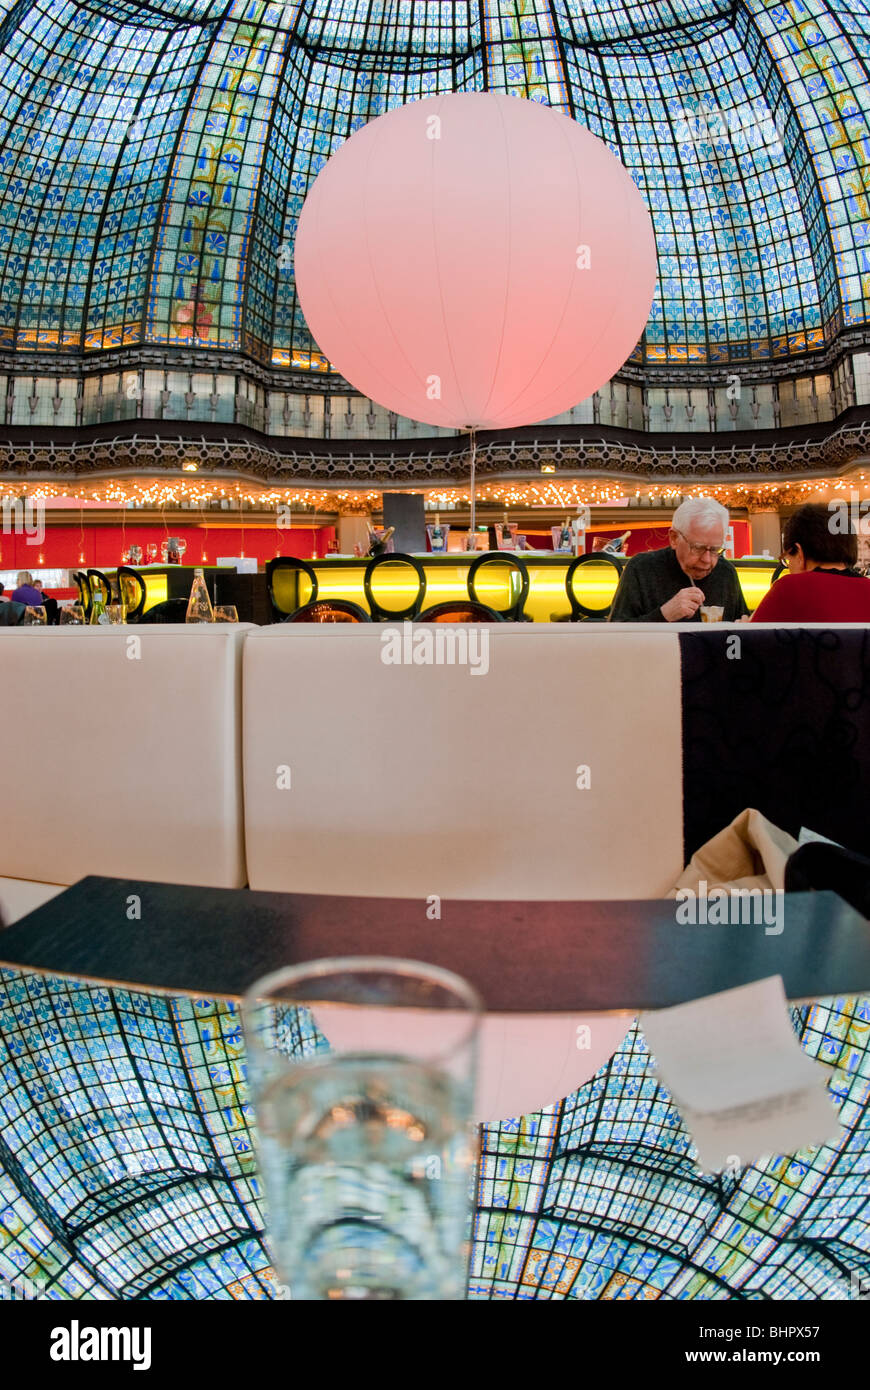 Verriere Cuisine Bordeaux ~ French Bistro Style Stock Photos French Bistro Style Stock Images